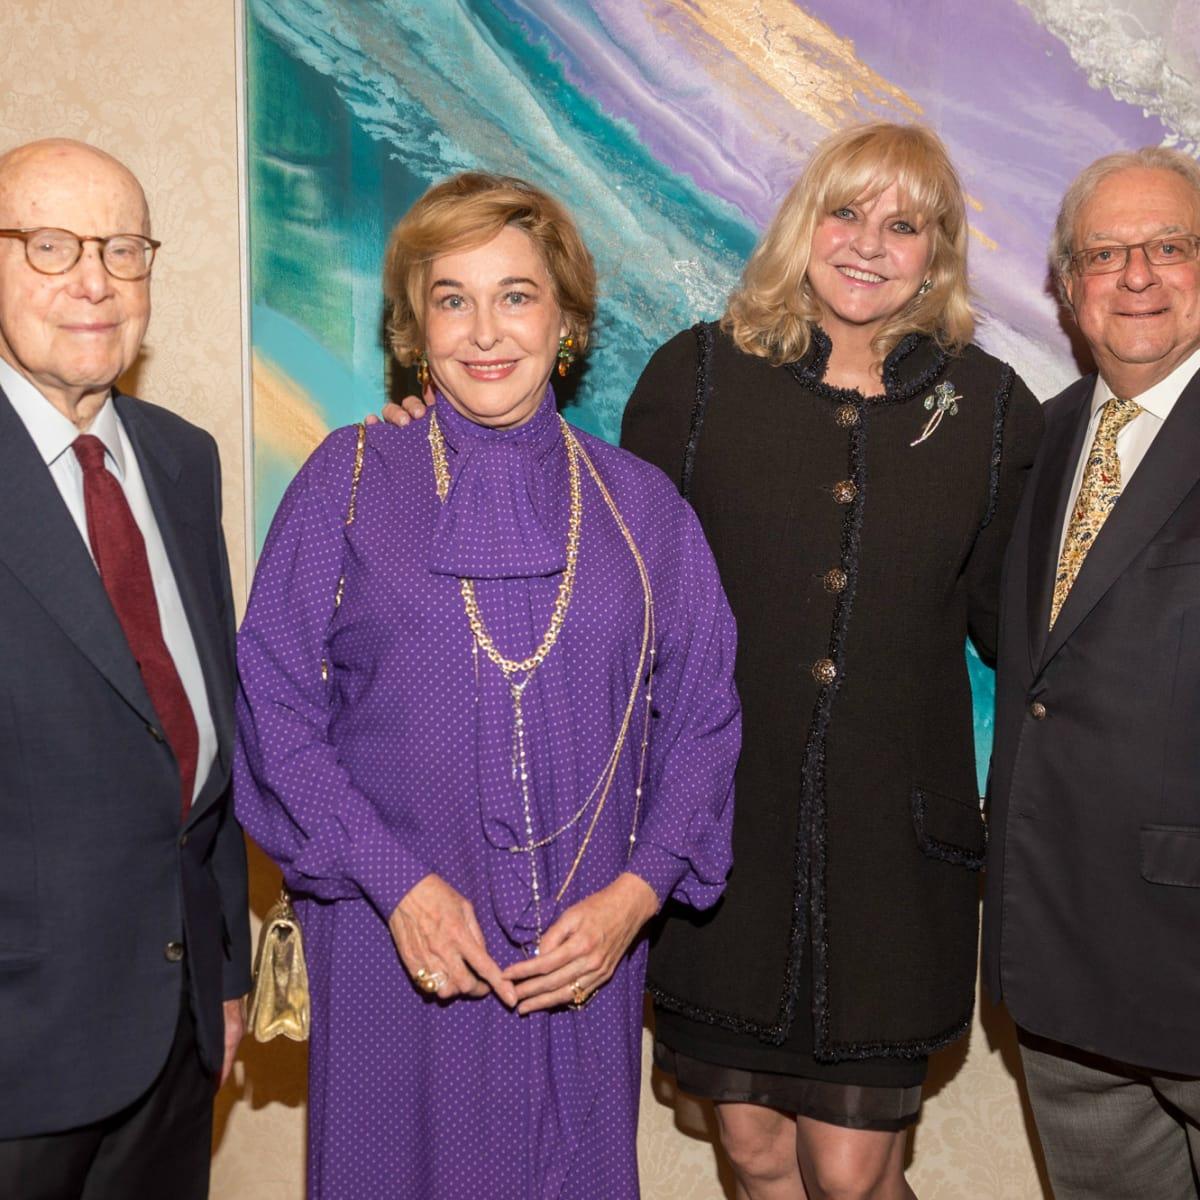 Gerald Hines, Barbara Hines, Becky ZImmerman, Steve Zimmerman